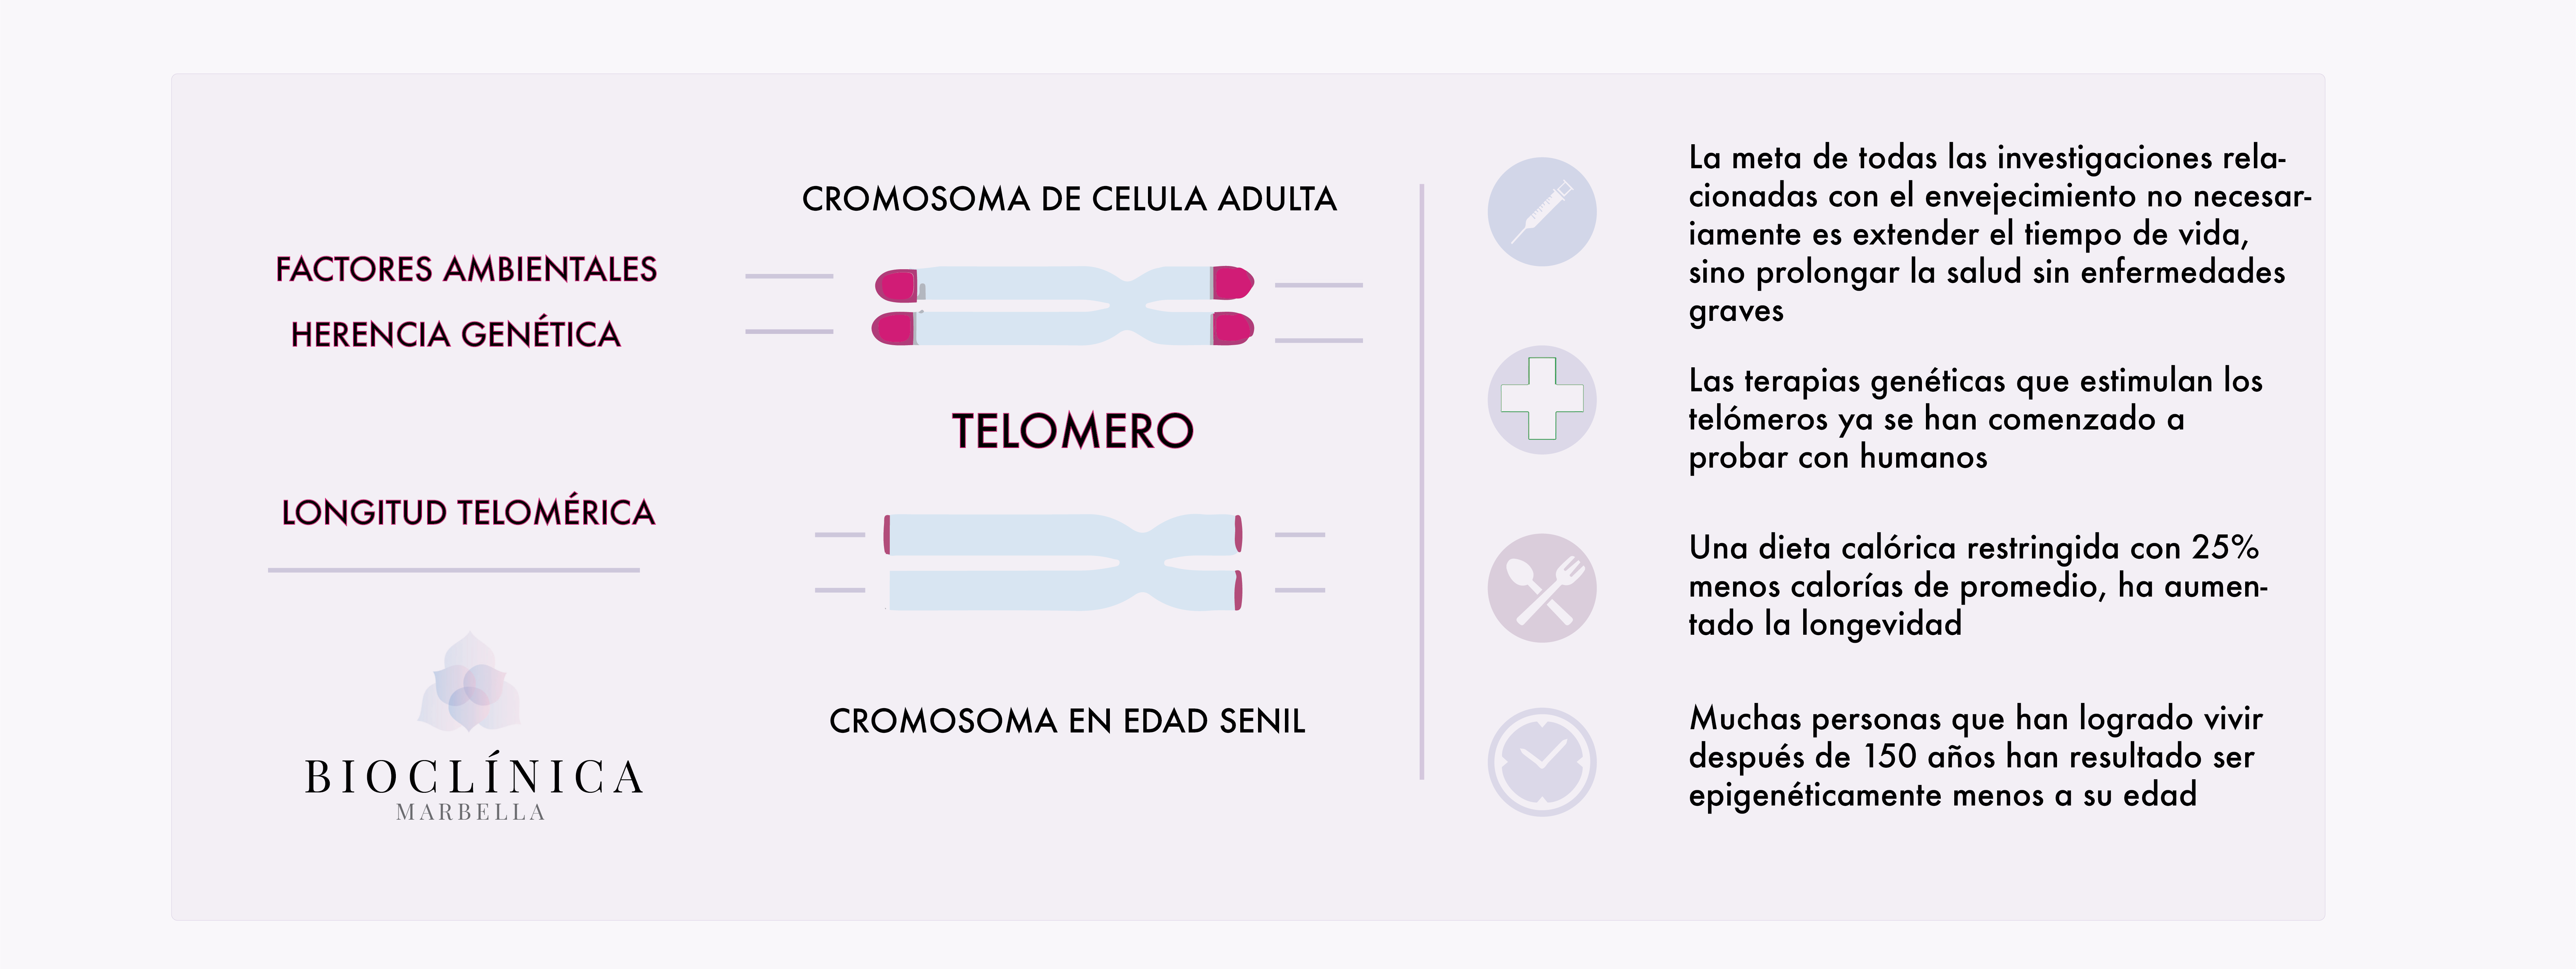 anti-aging-telomeros-ADN-antiaging-antiage-bioclinica-marbella-medicinapreventiva